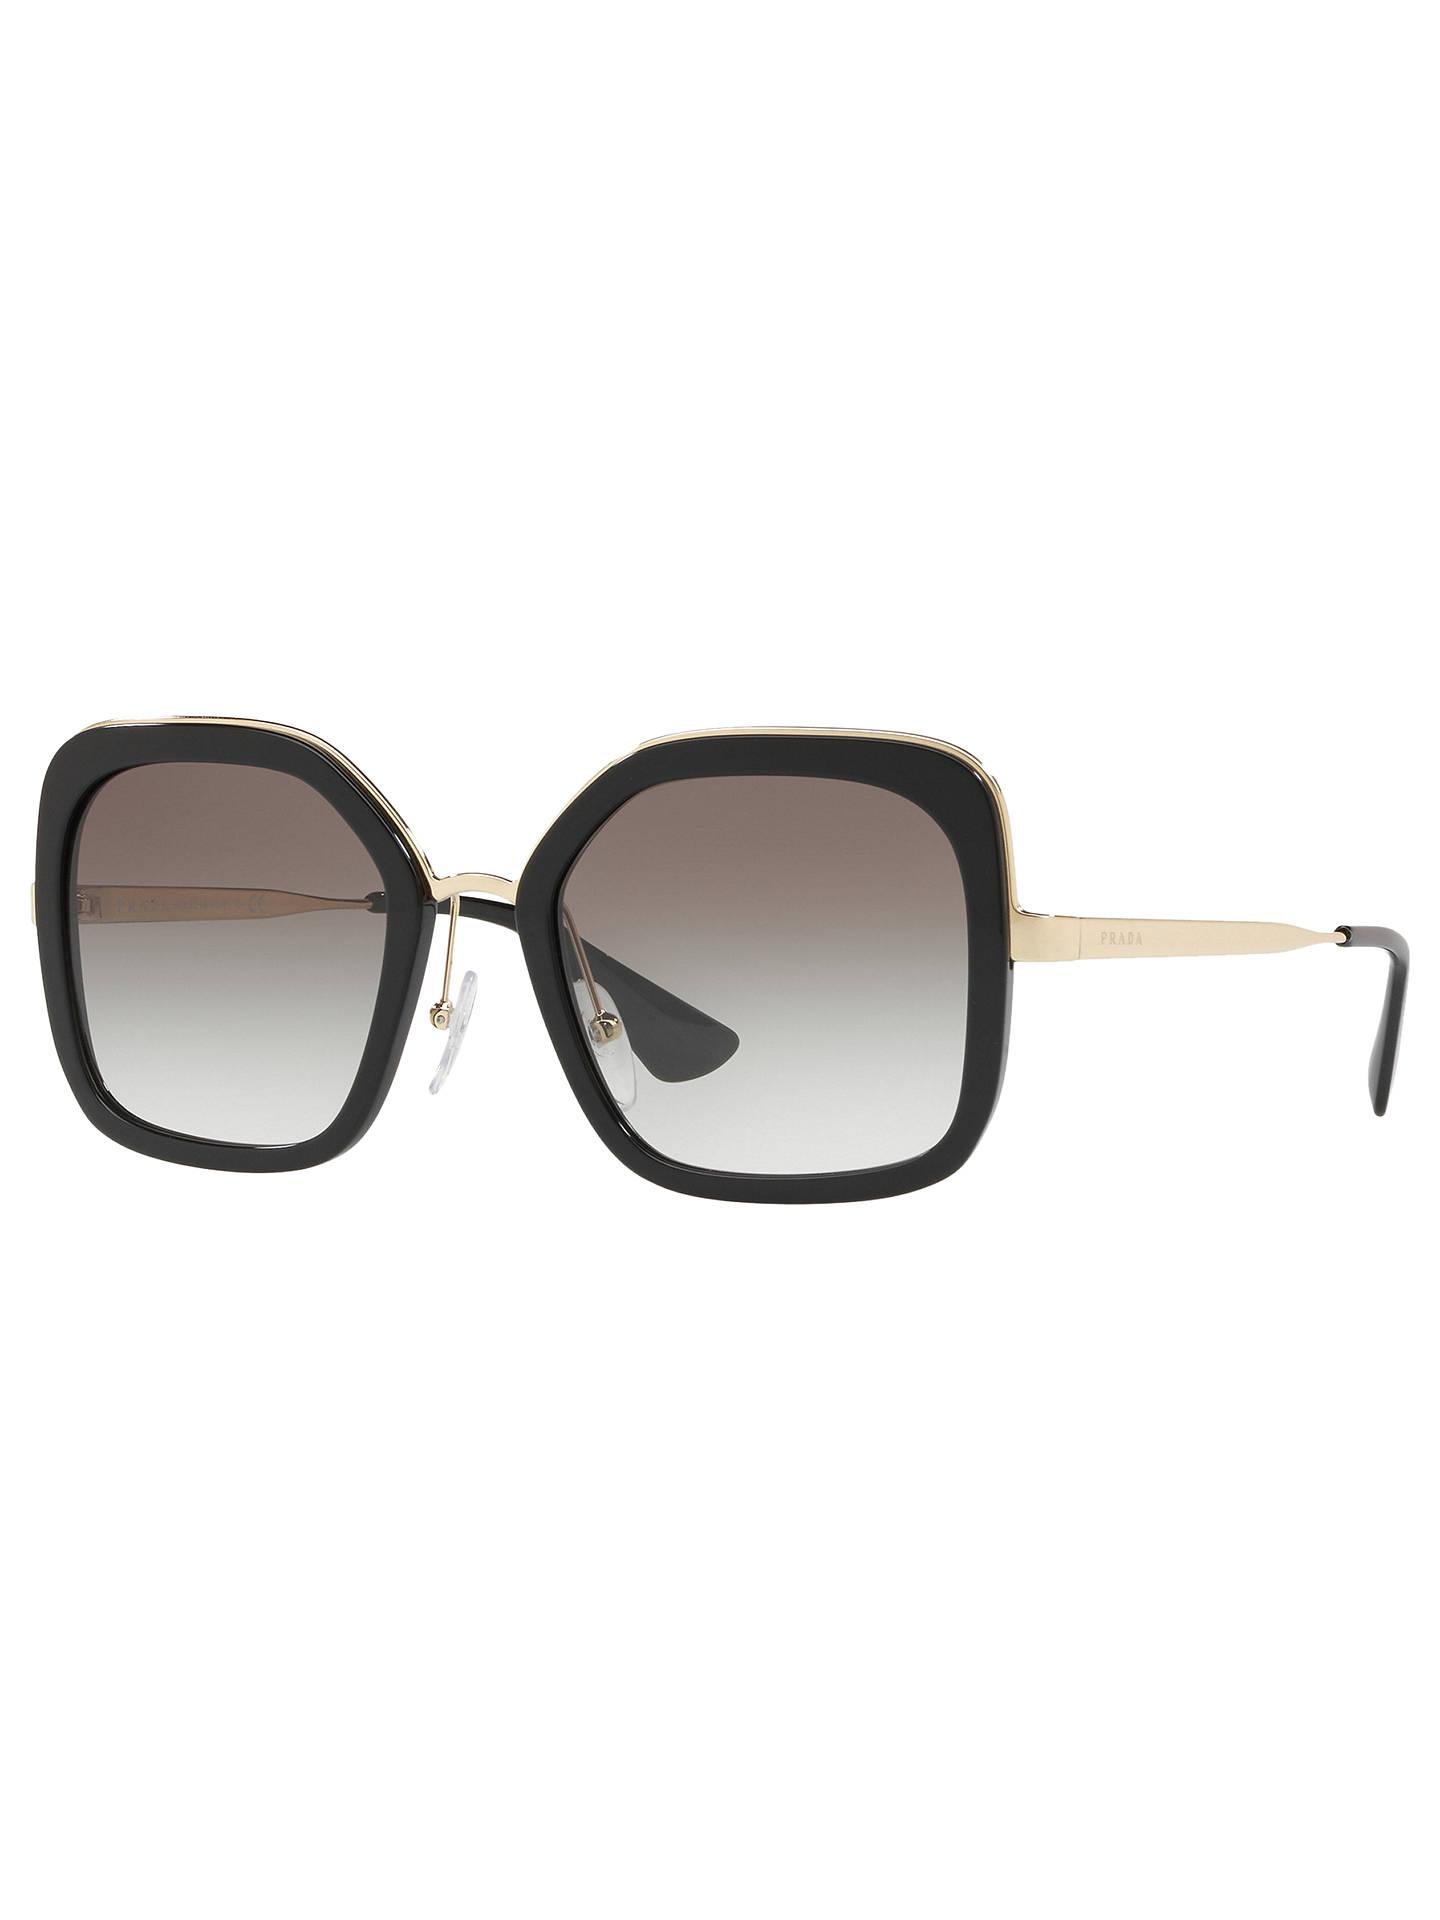 2b23dde2a8f Prada PR 57US Women s Square Sunglasses at John Lewis   Partners